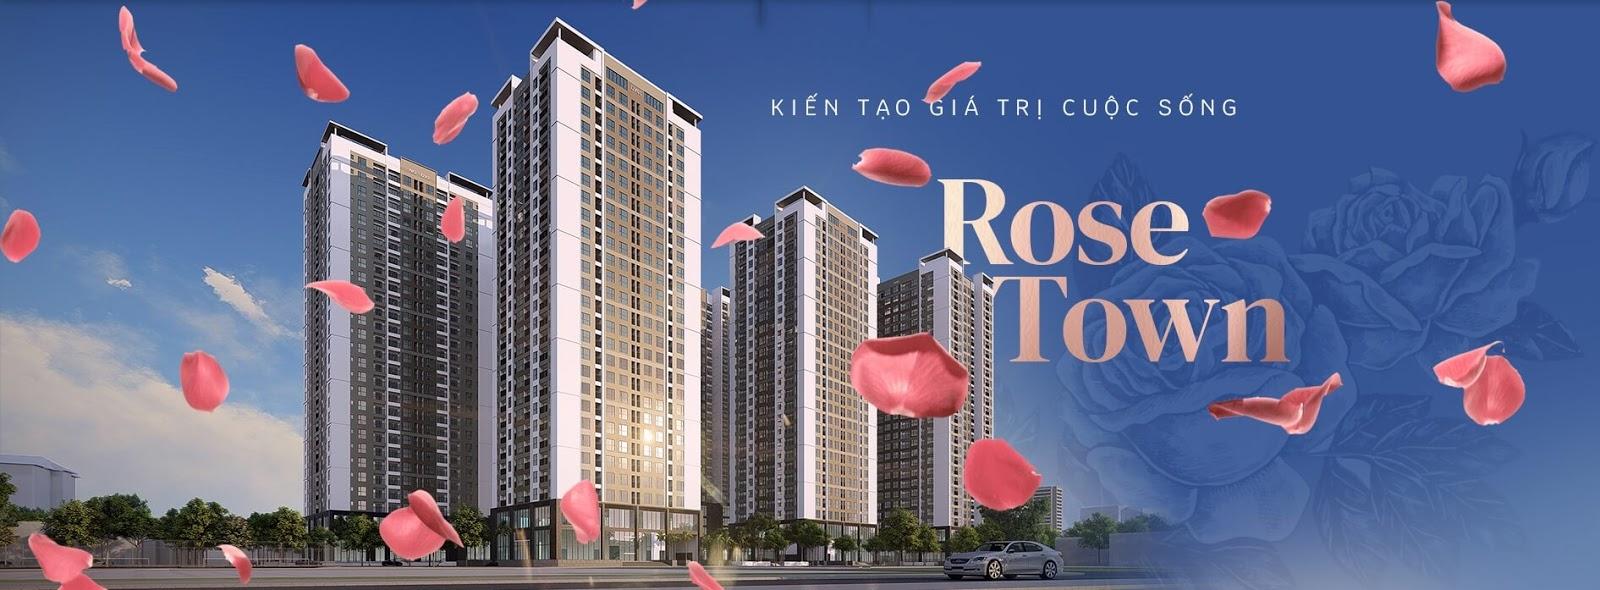 Slide-Rose-Town